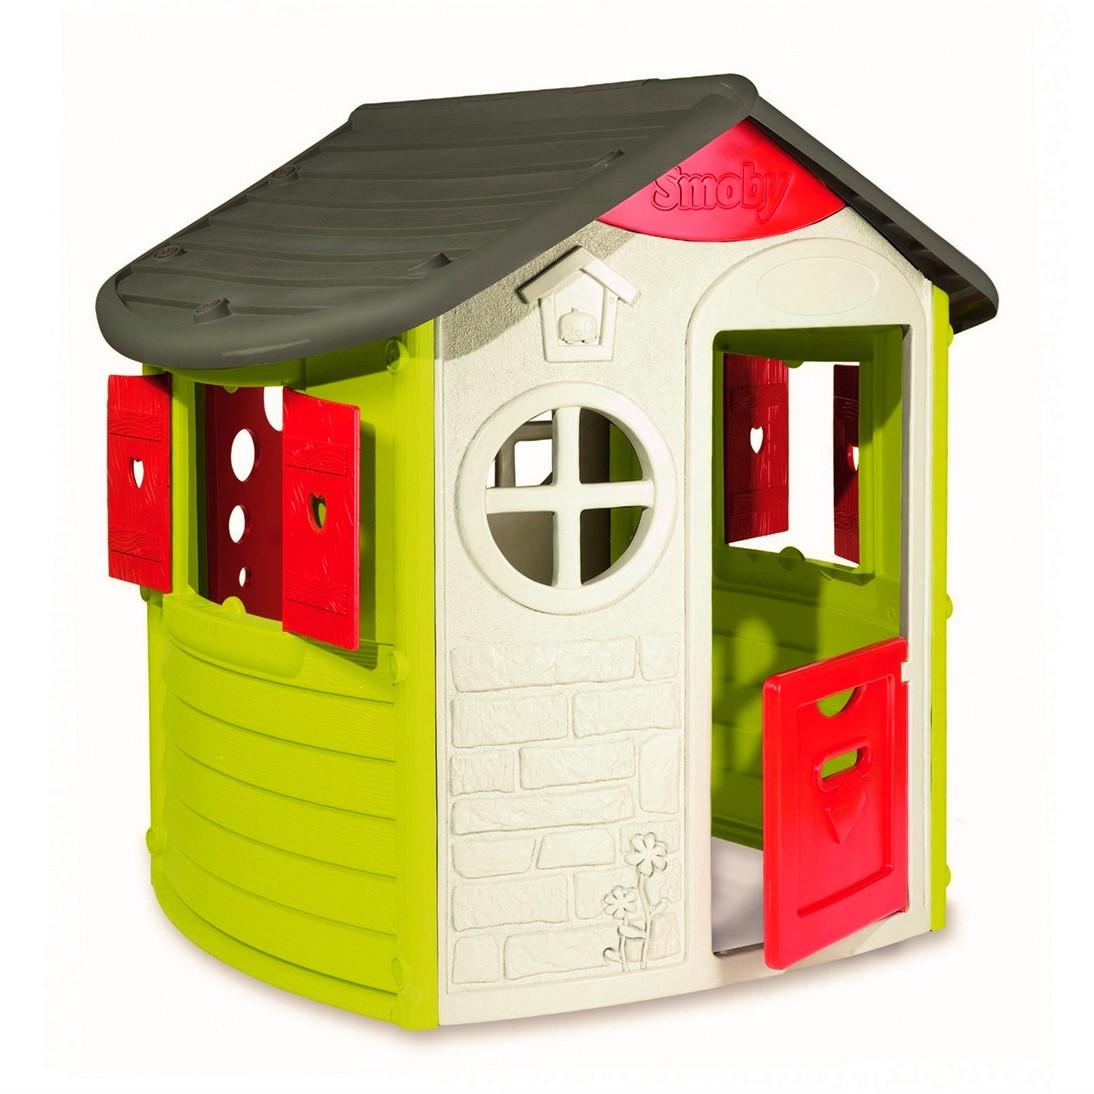 "Игровые площадки «Smoby» (310263) домик лесника ""Jura Lodge"" со ставнями и ключом"